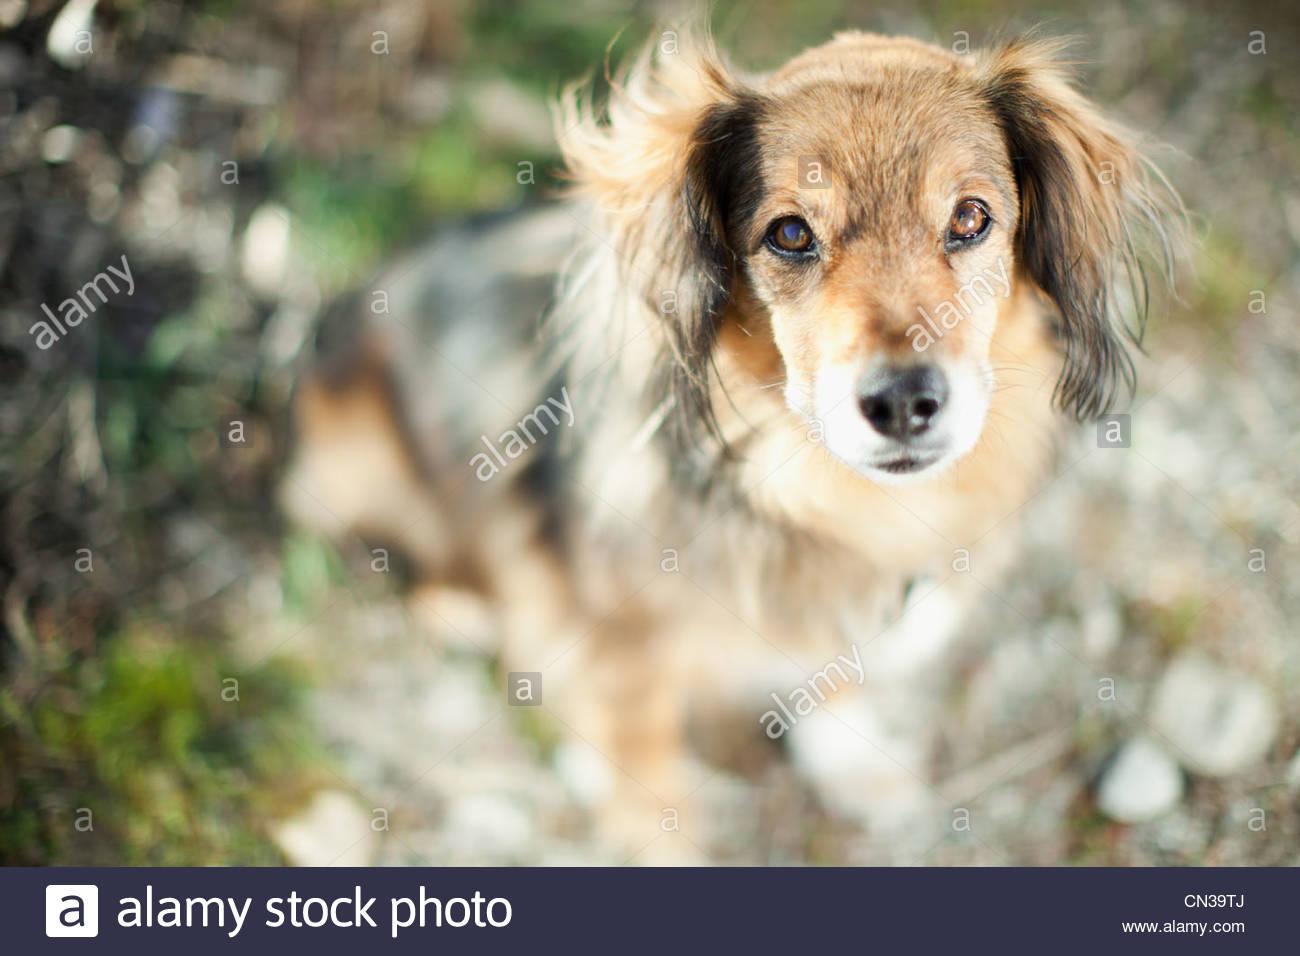 Portrait of a pet dog - Stock Image